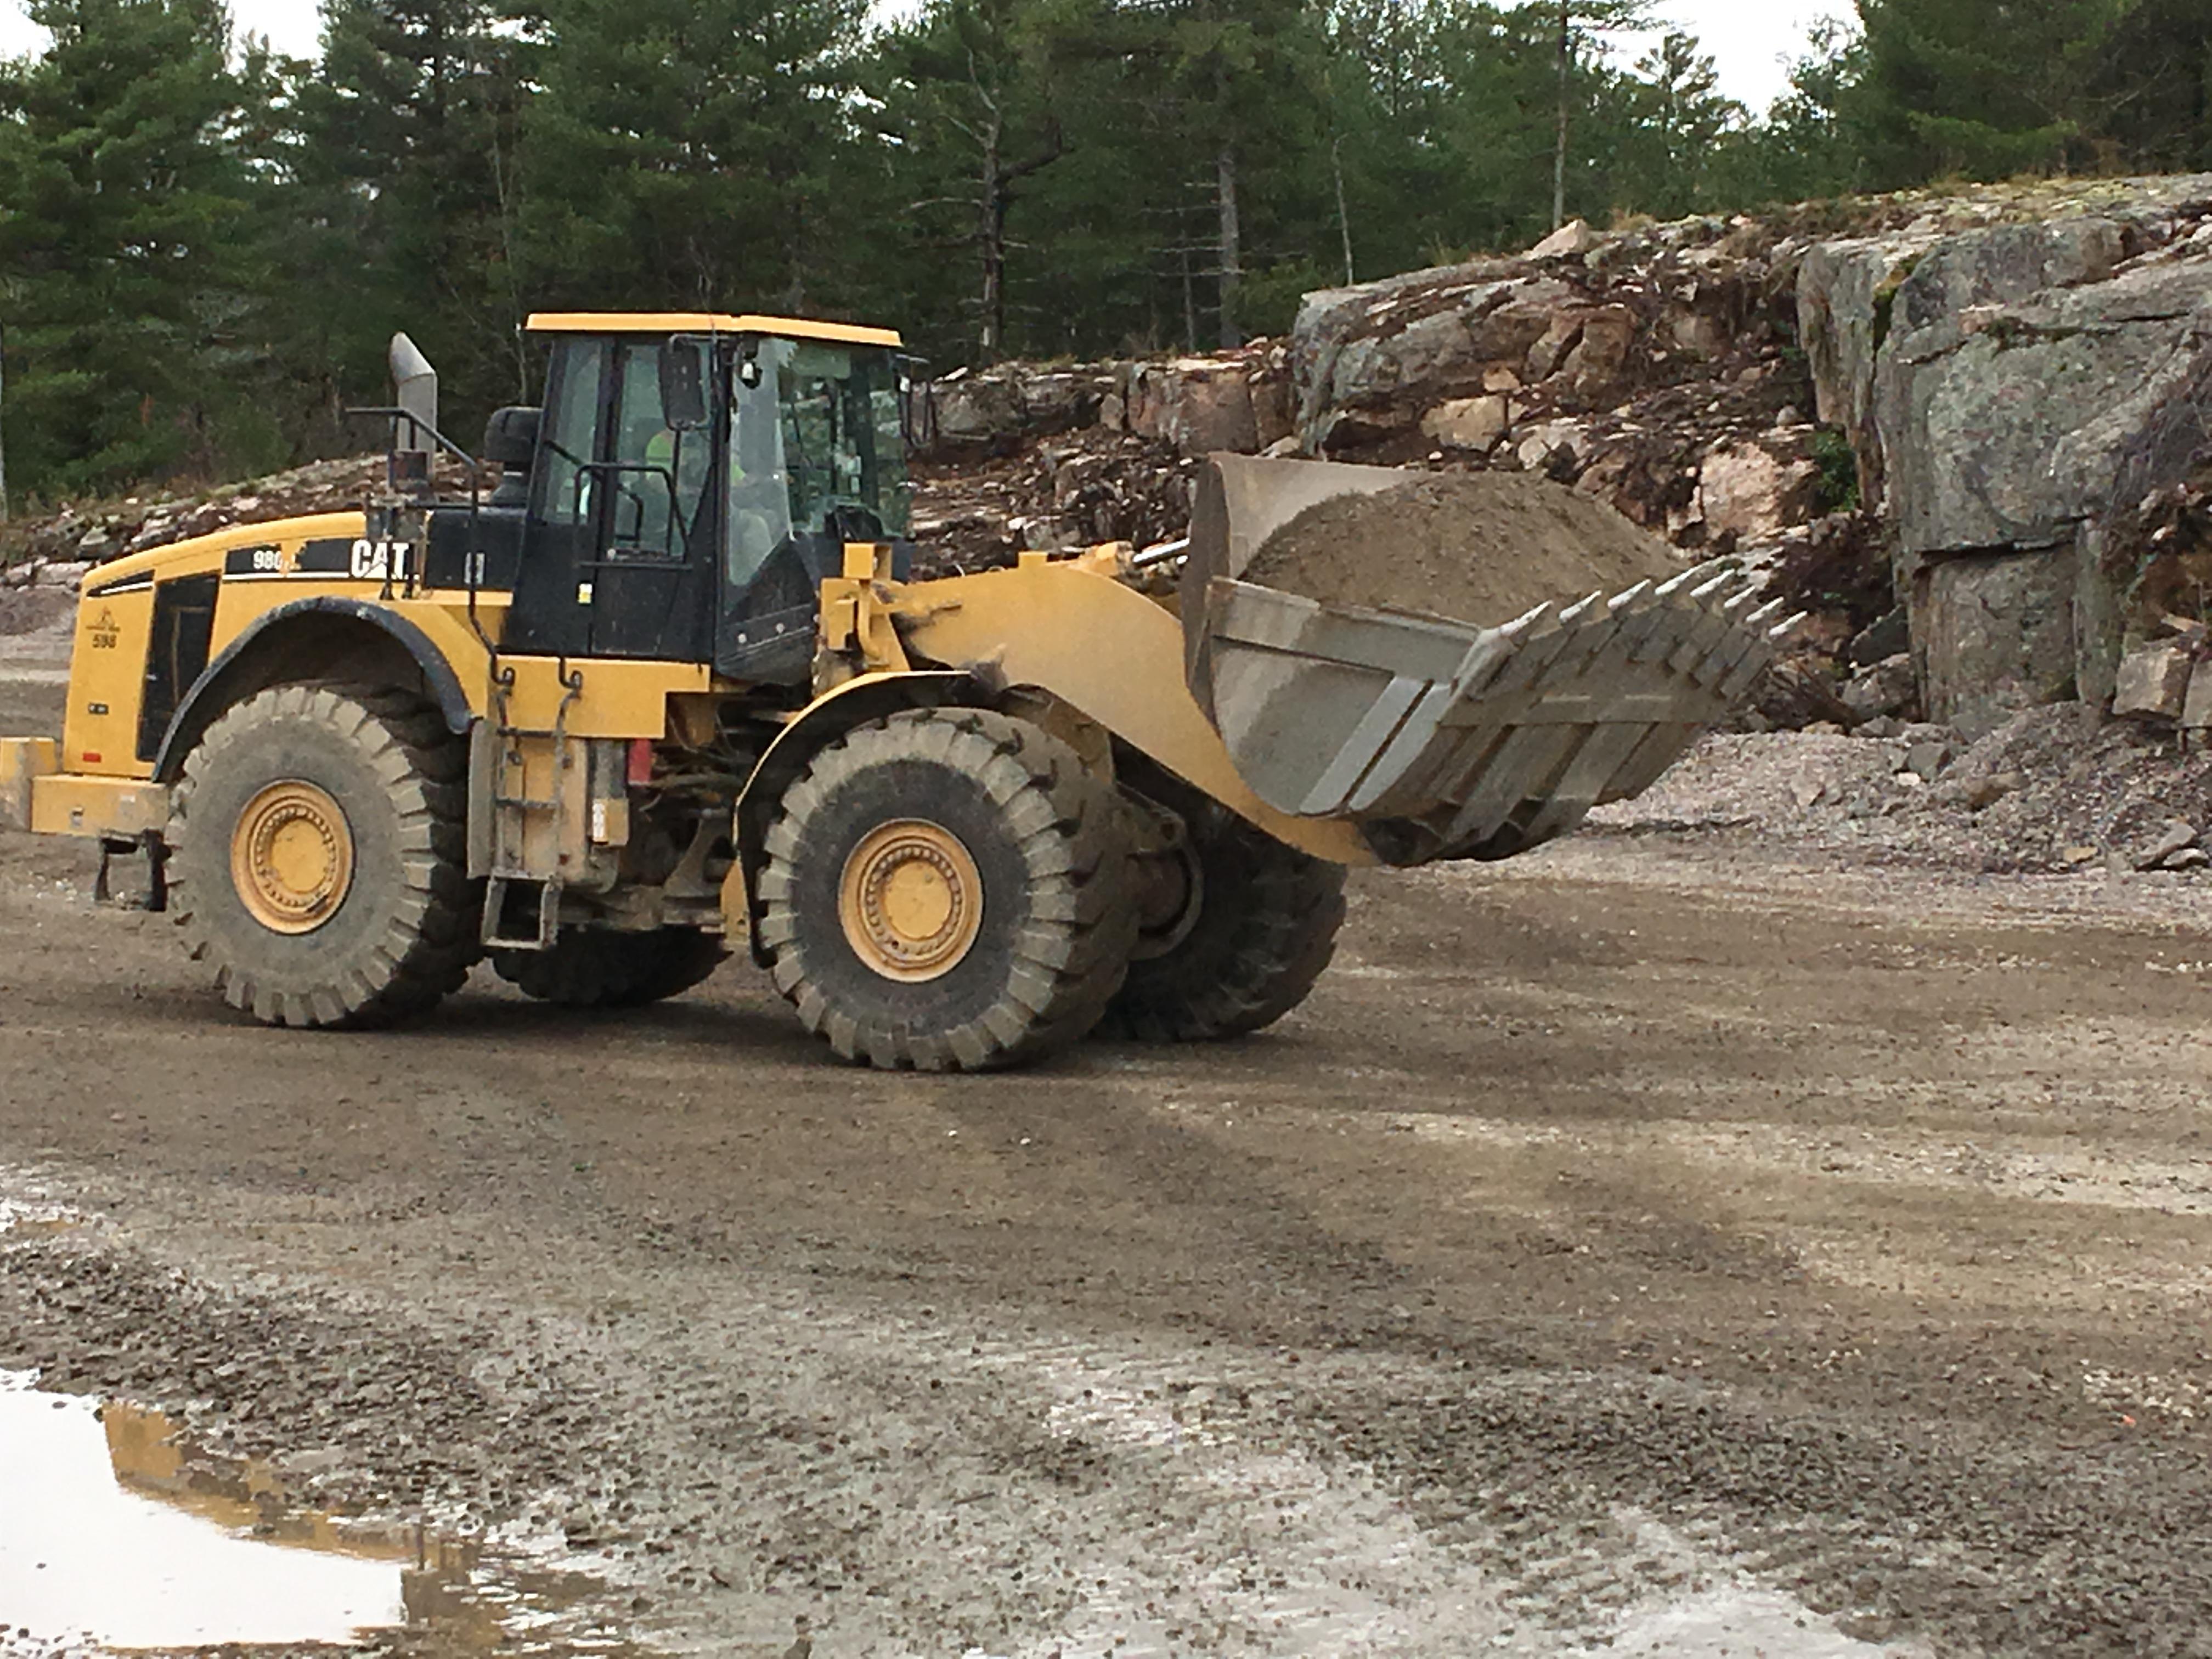 front loader rental equipment lifting aggregates